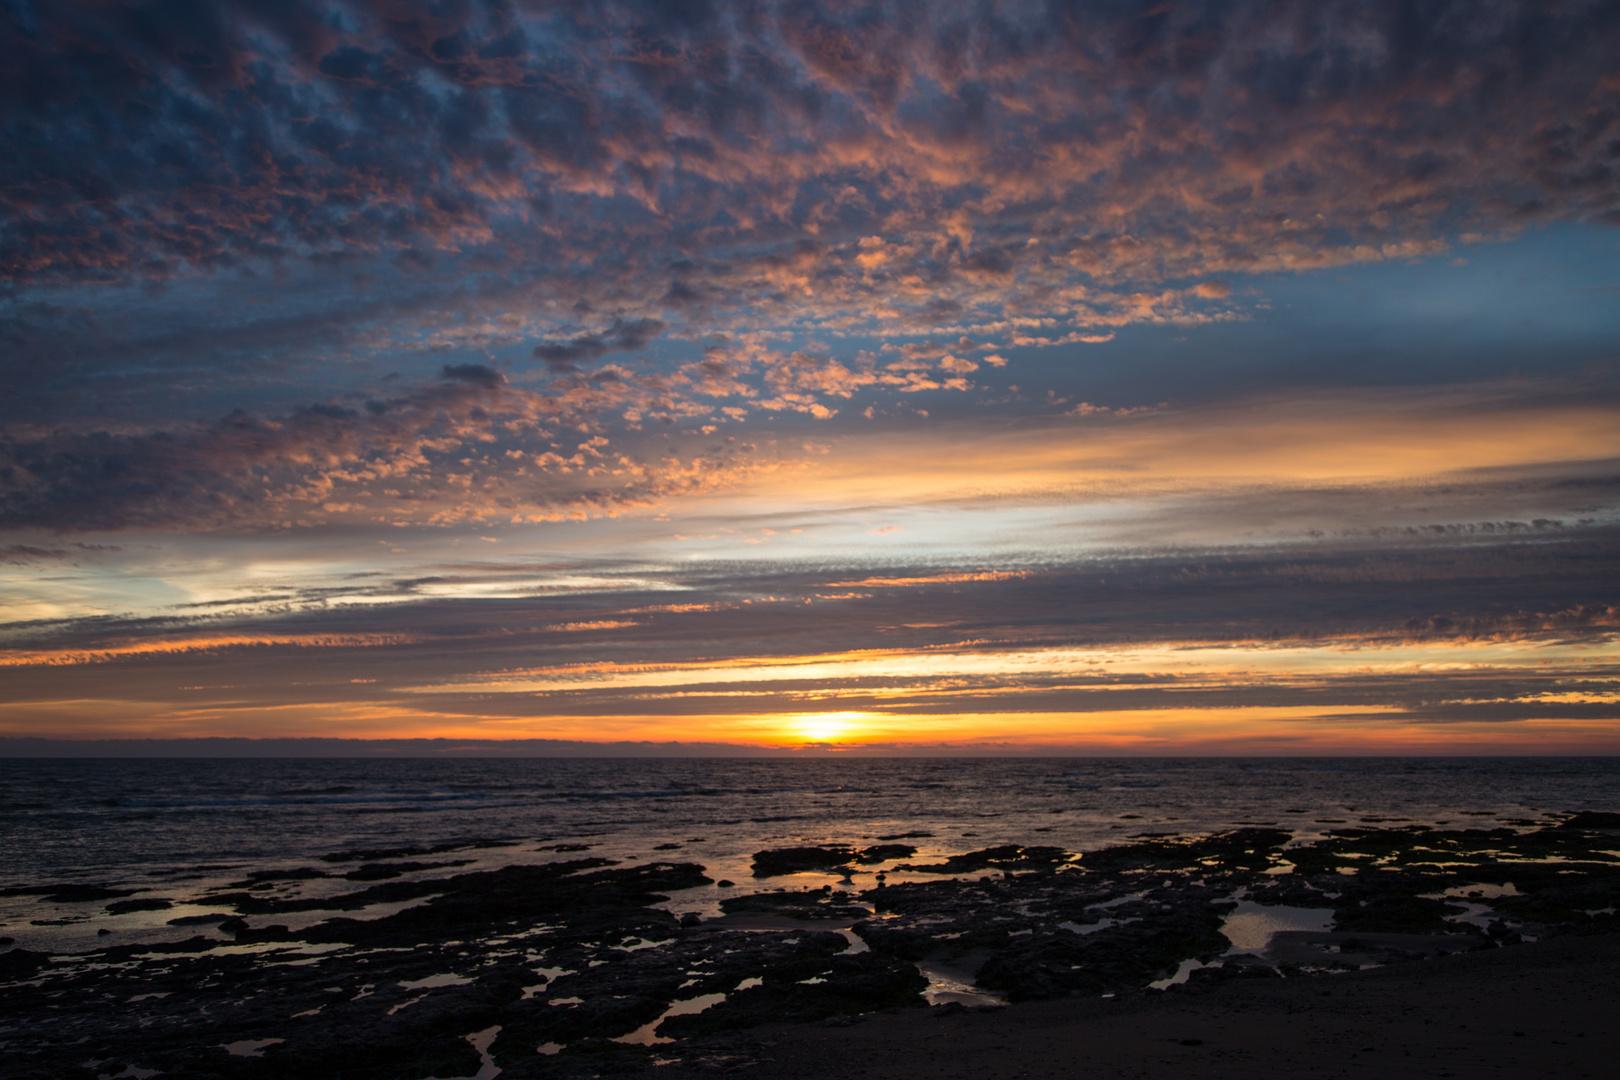 Sonnenuntergang bei Bretignolles-sur-Mer